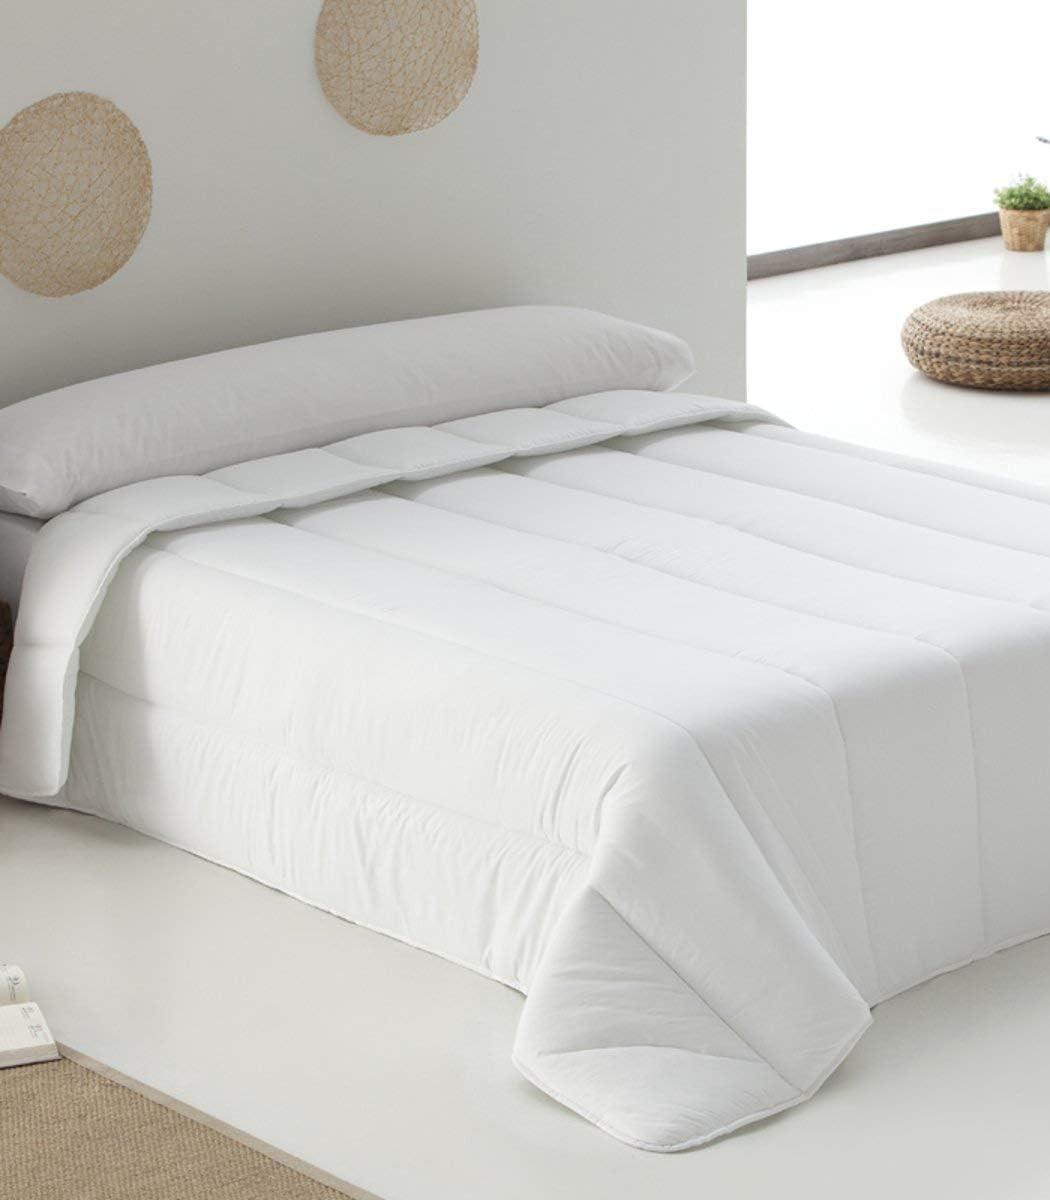 Belnou Hestia-Edredón Relleno Nórdico Blanco De 400 Gr, Tacto Seda, Confort Invernal, (Cama 180 (260 X 240 Cm)